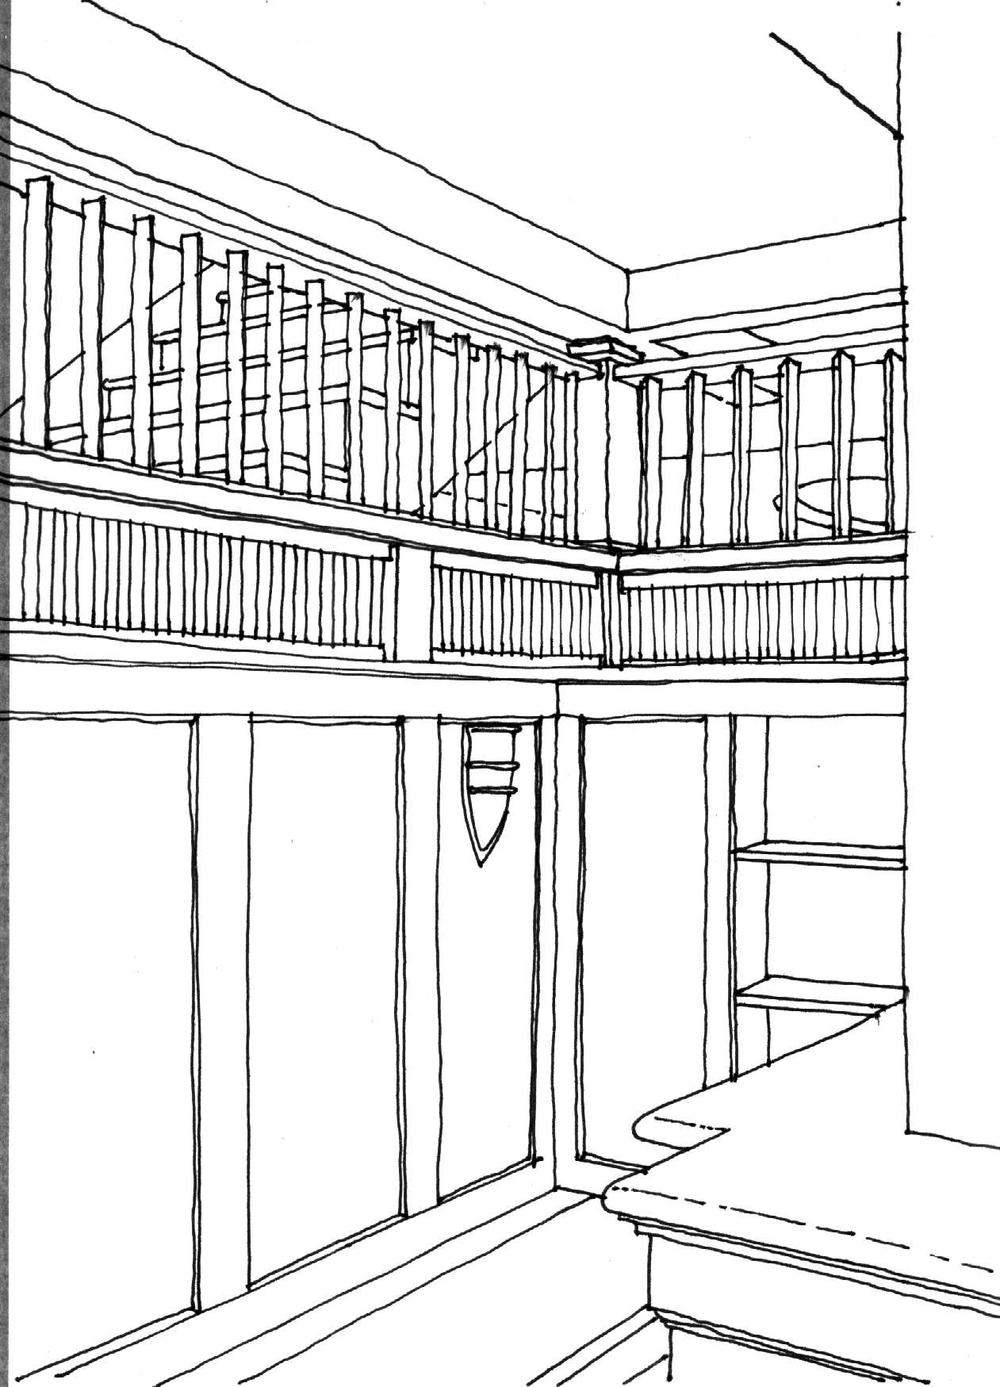 KR006-inglenook-sketch.jpg